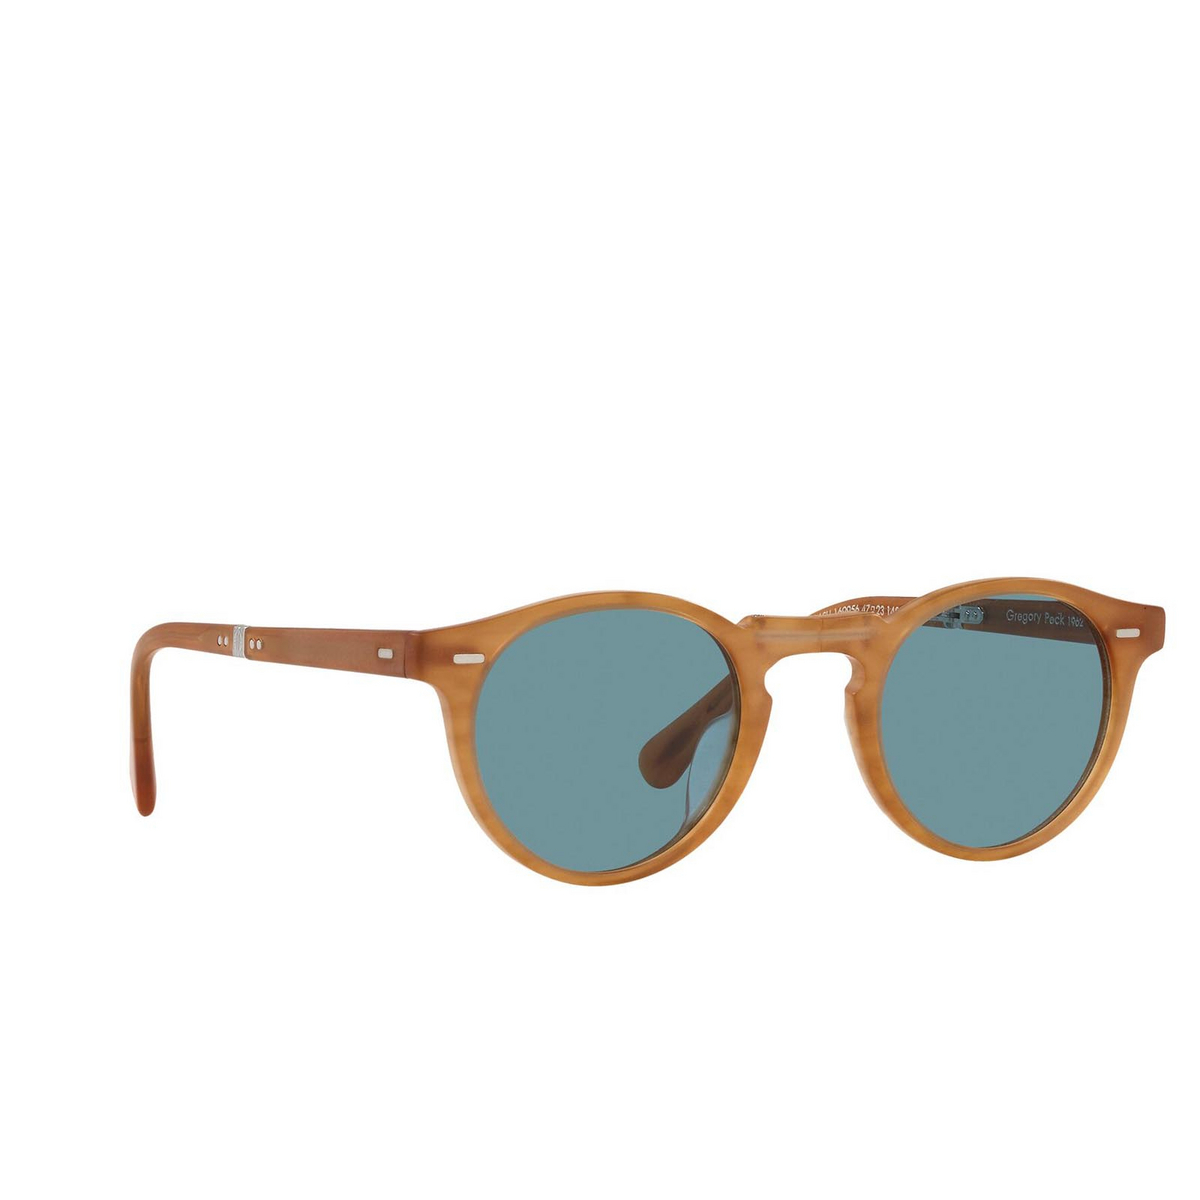 Oliver Peoples® Round Sunglasses: Gregory Peck 1962 OV5456SU color Semi Matte Amber Tortoise 169956 - three-quarters view.